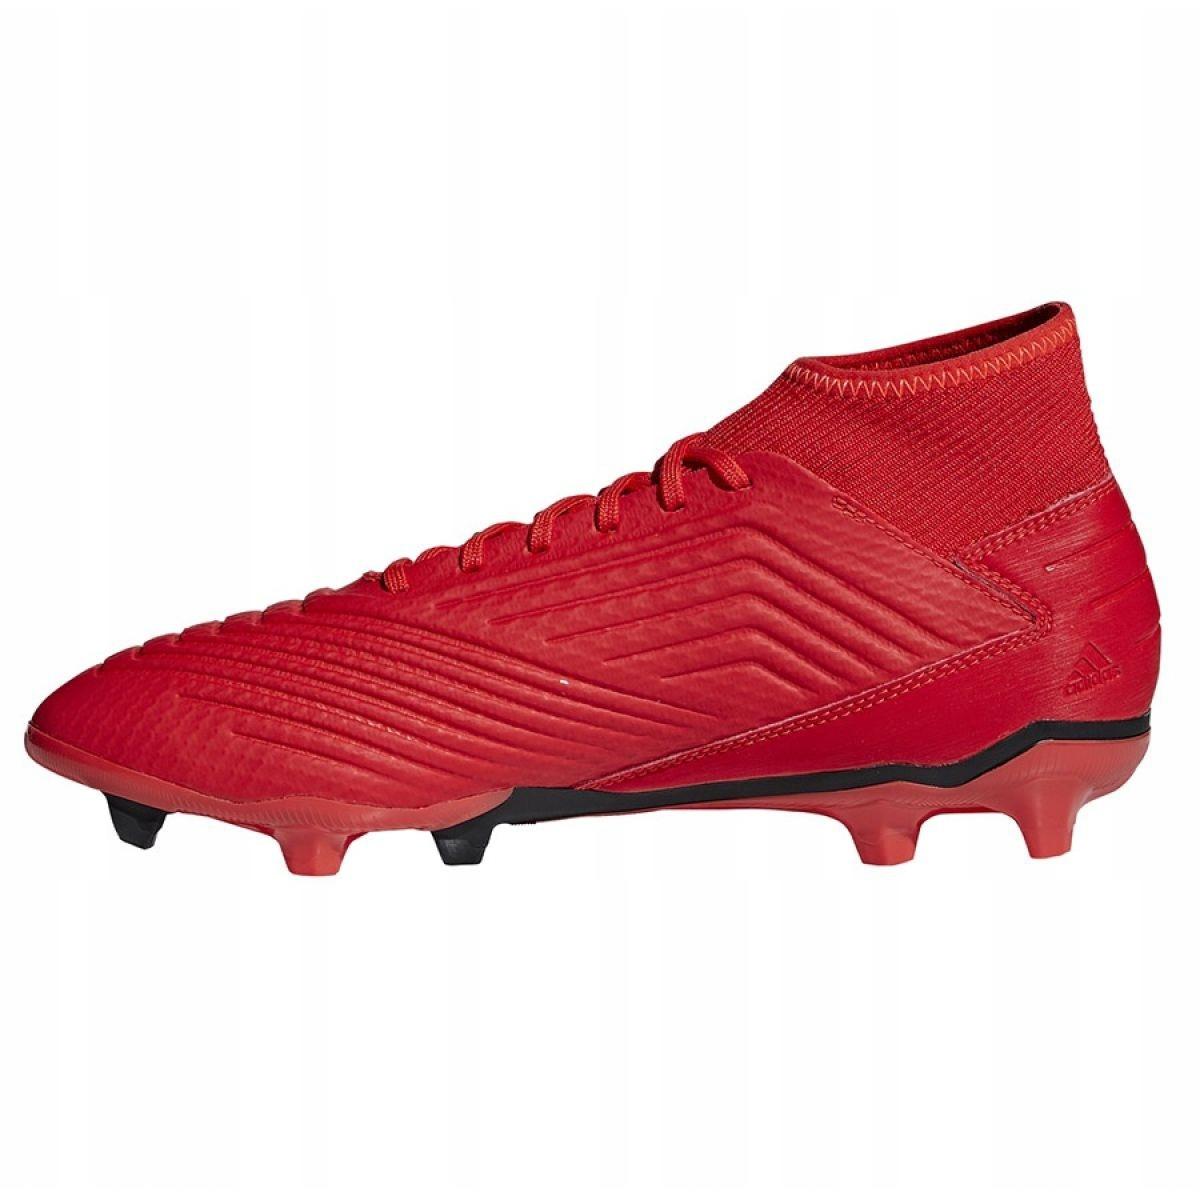 Chaussures de foot adidas Predator 19.1 FG RougeRouge